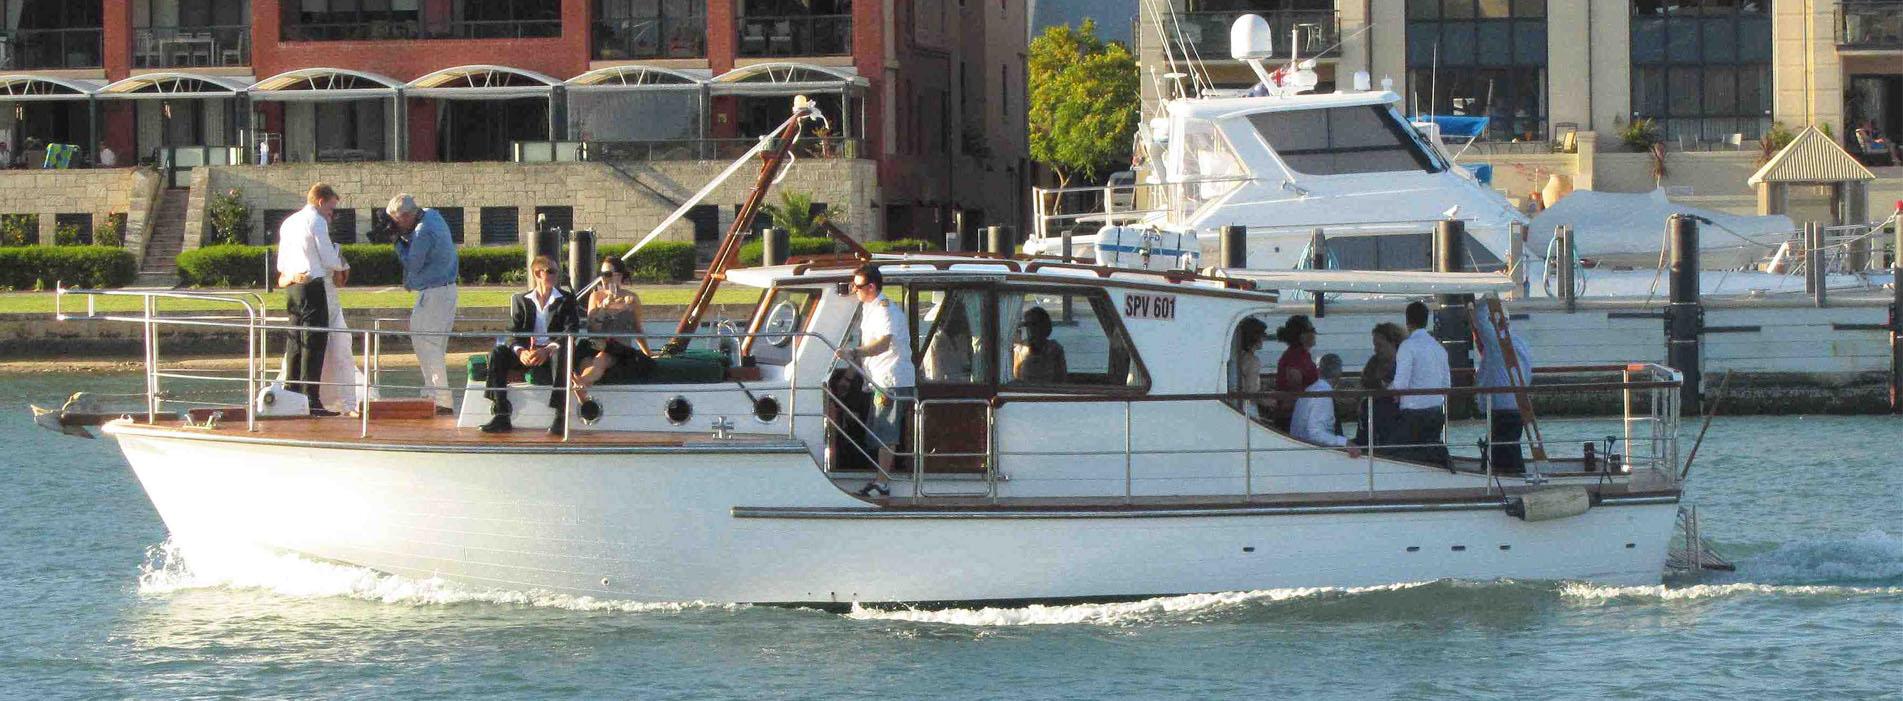 WEDDING BOAT CHARTERS and transfers Perth WA